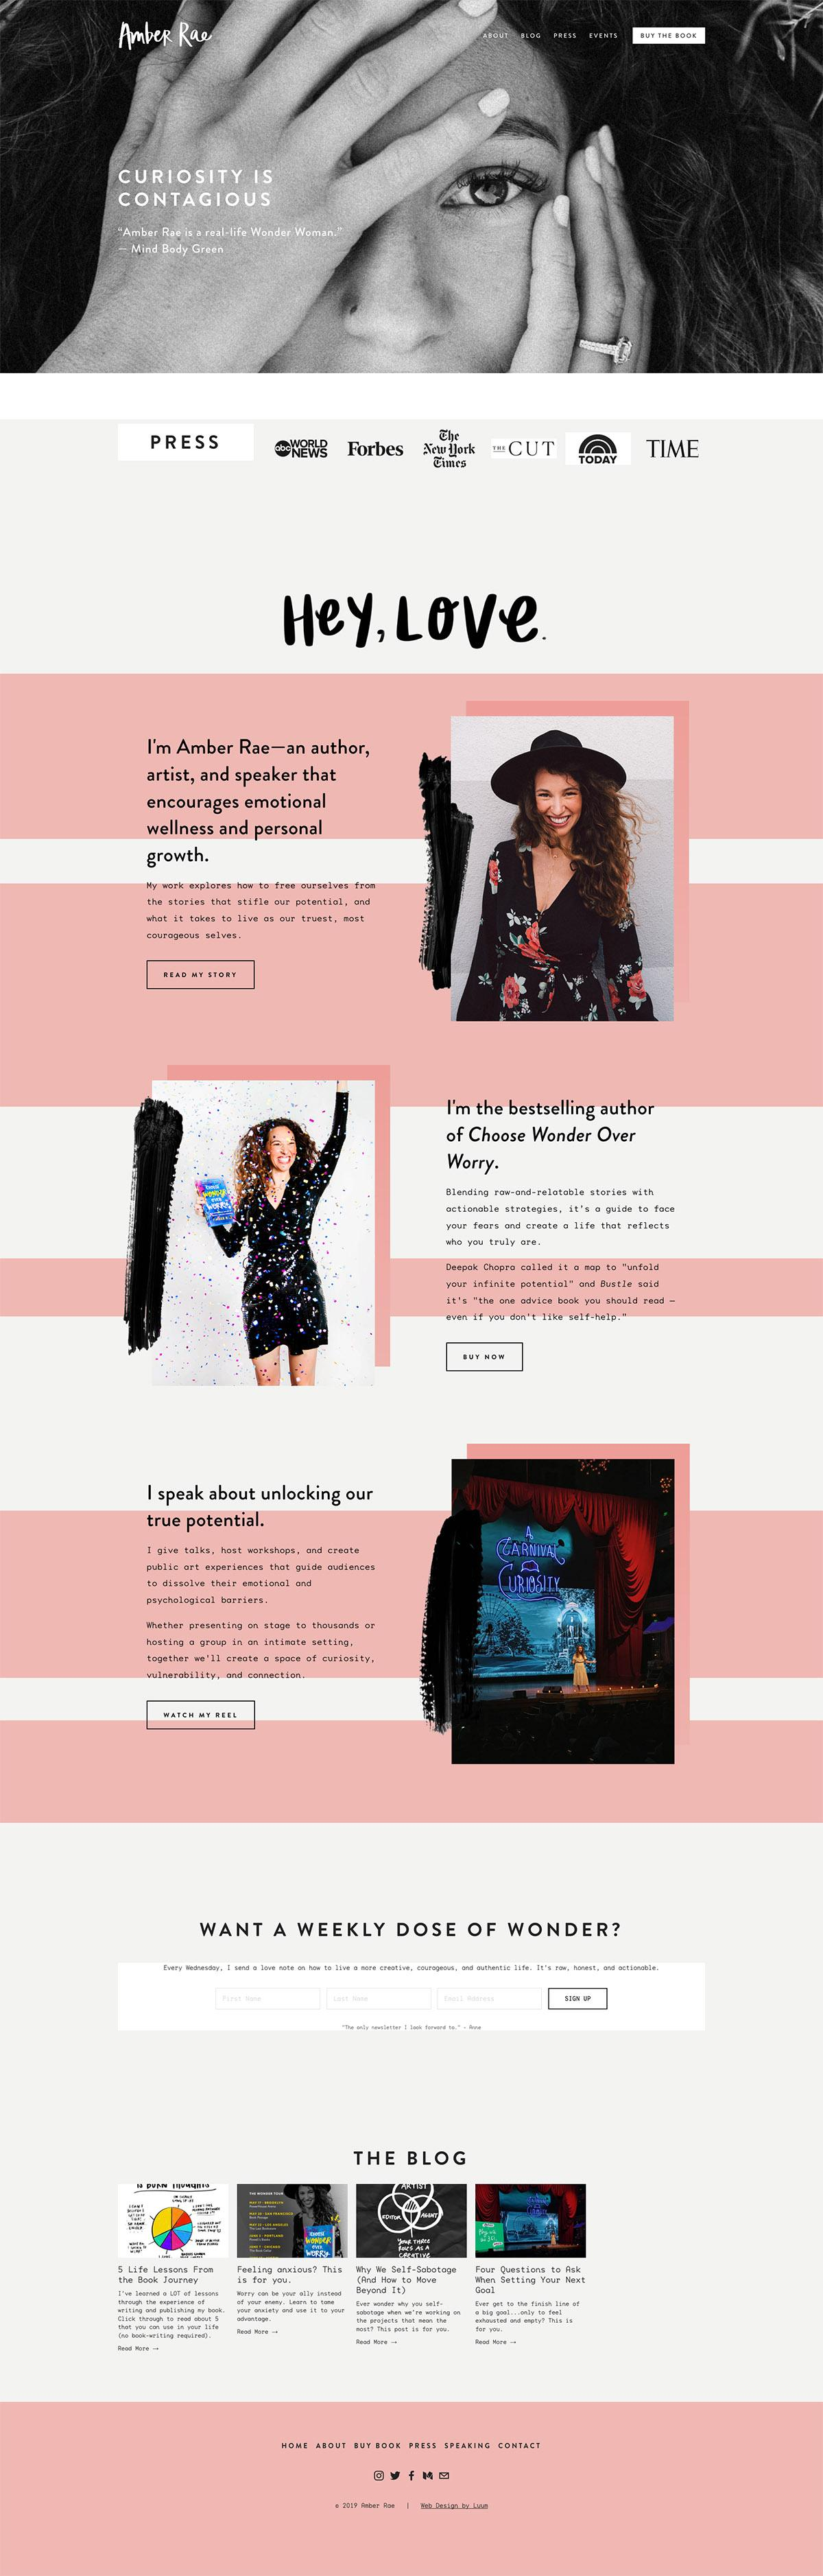 eCommerce website: Amber Rae